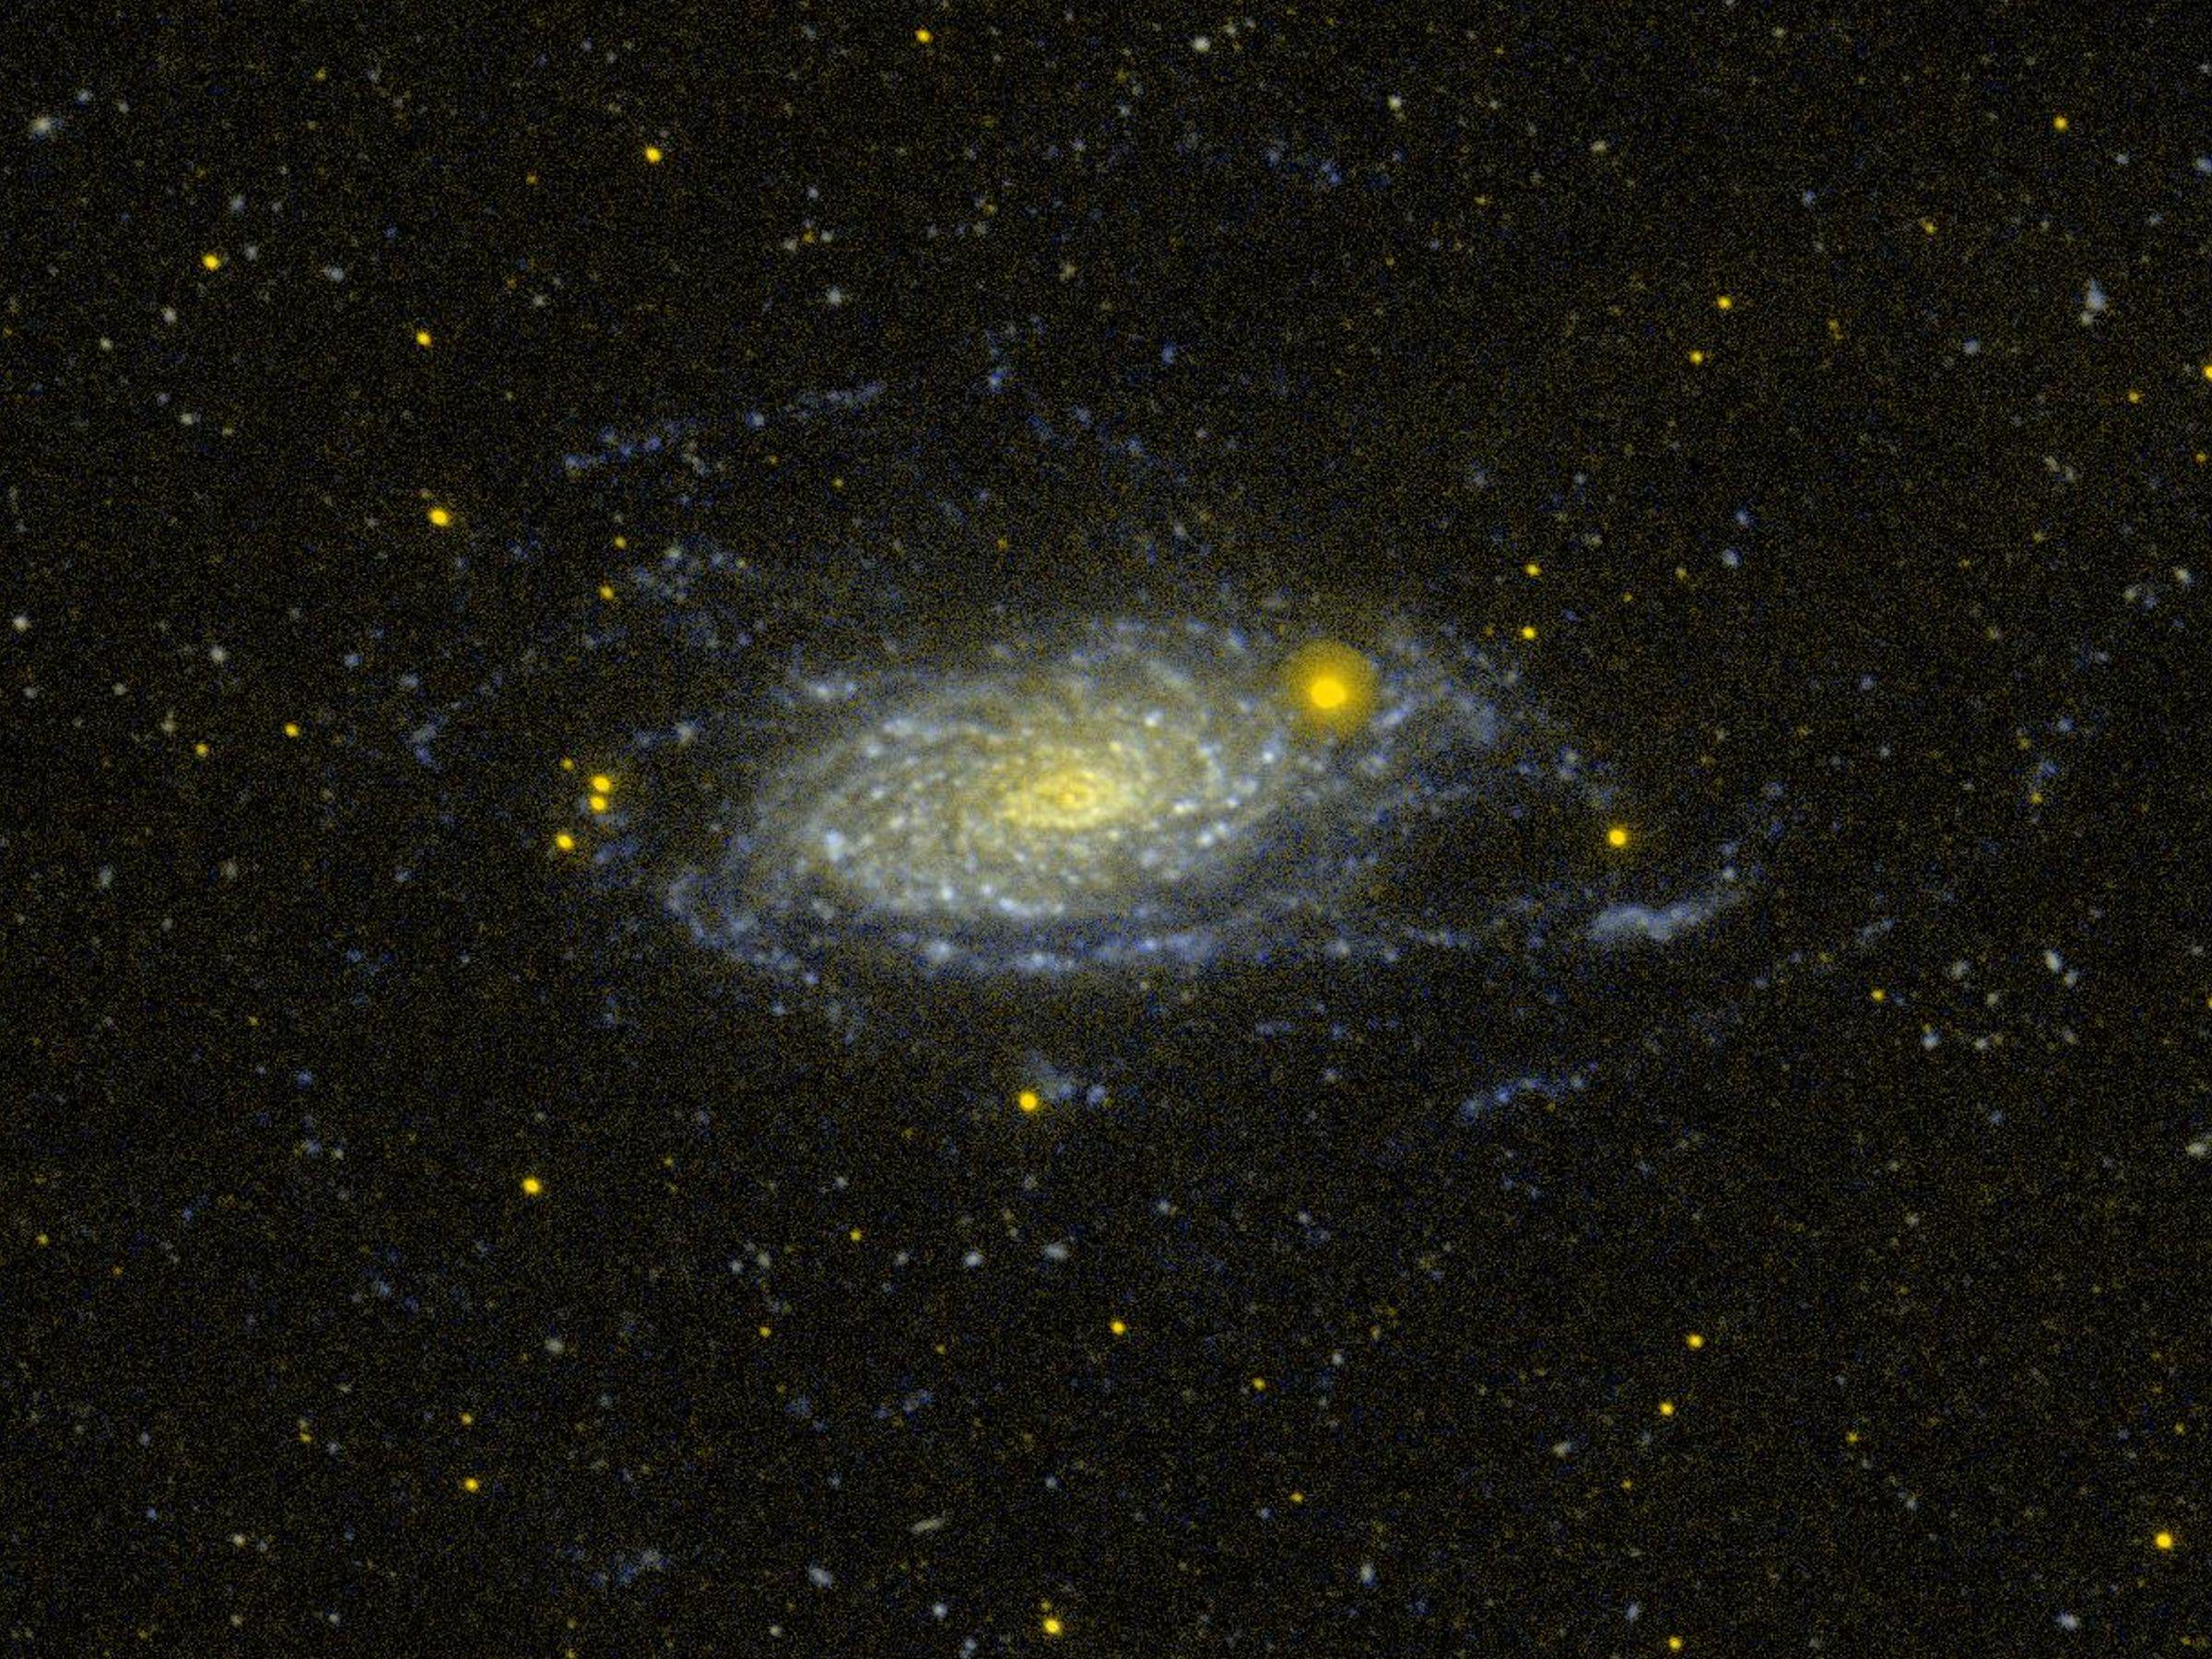 hq galaxy nasa - photo #20